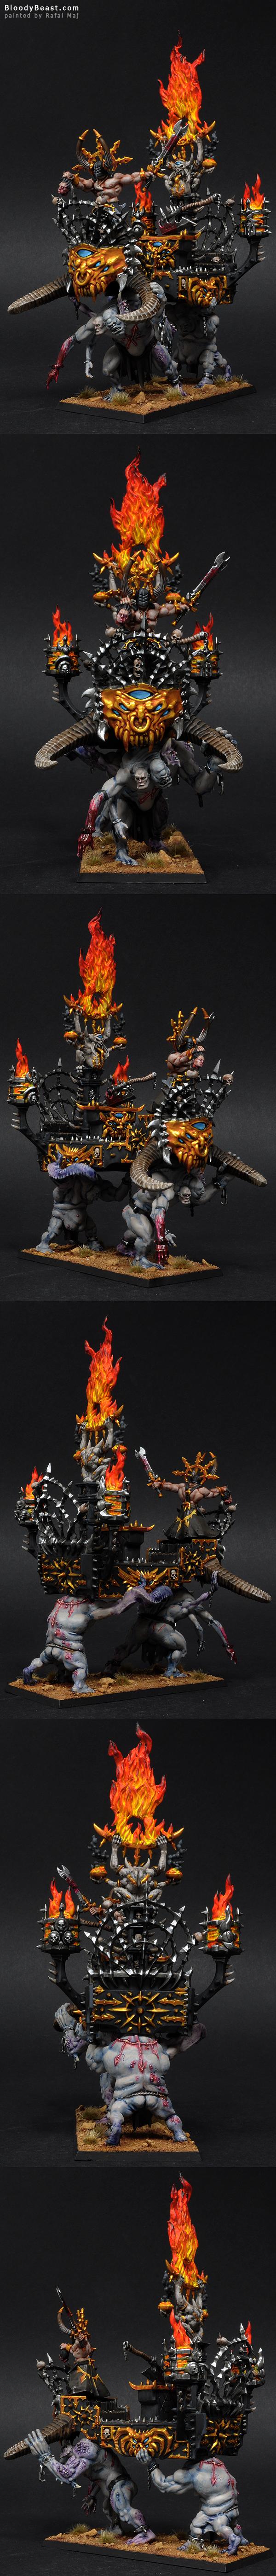 Warshrine of Chaos Undivided painted by Rafal Maj (BloodyBeast.com)